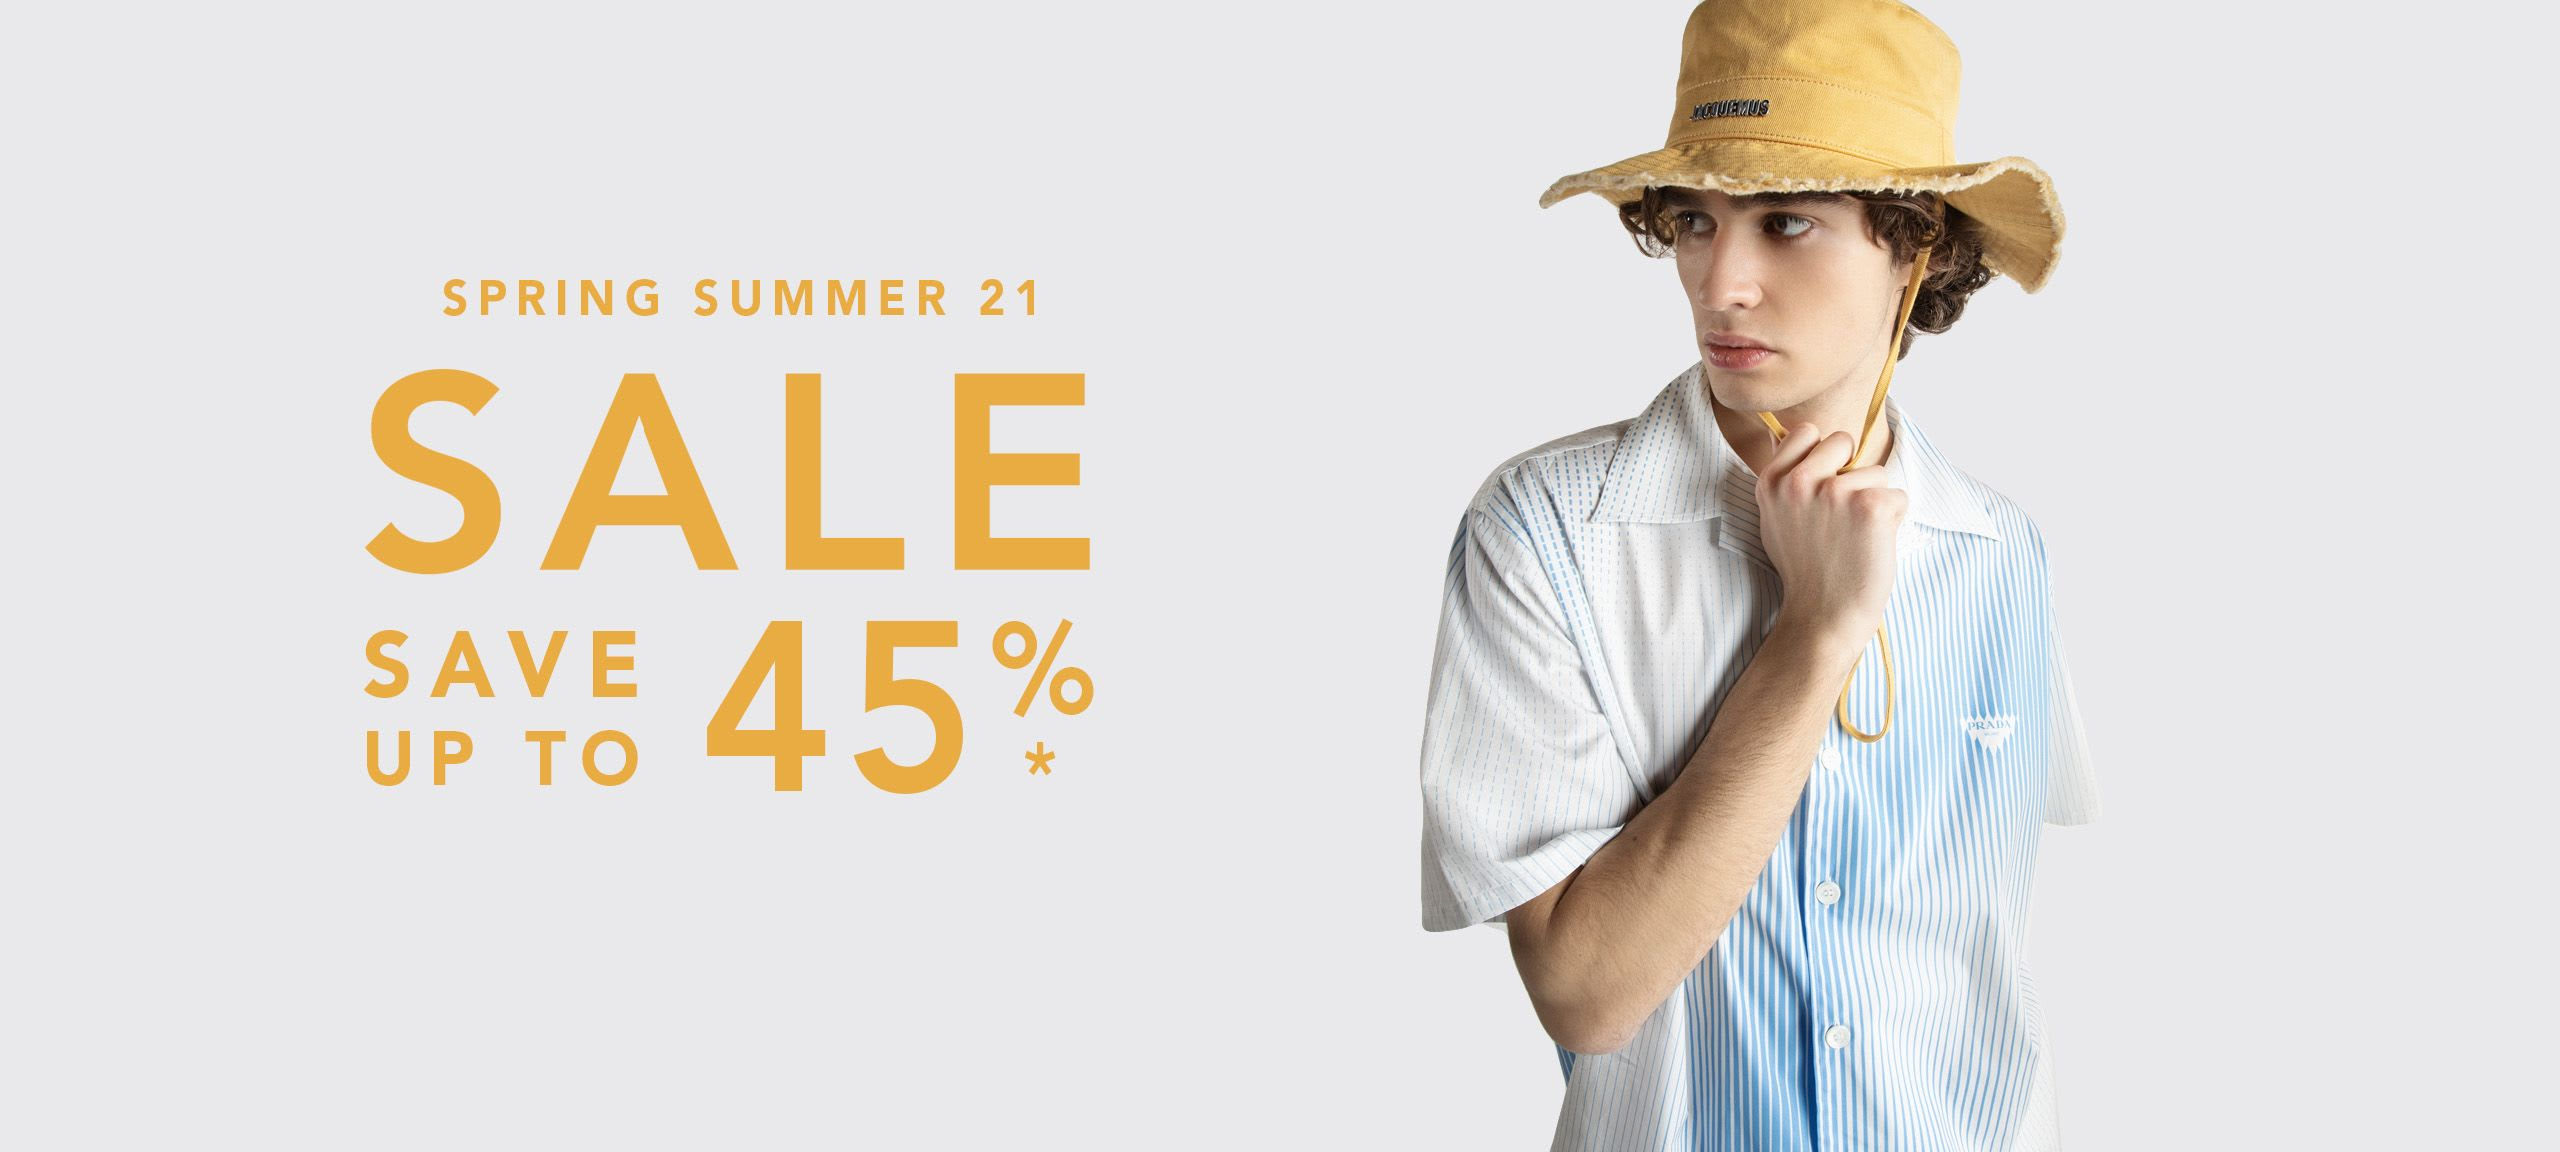 Men Spring Summer 21 Sale by italist